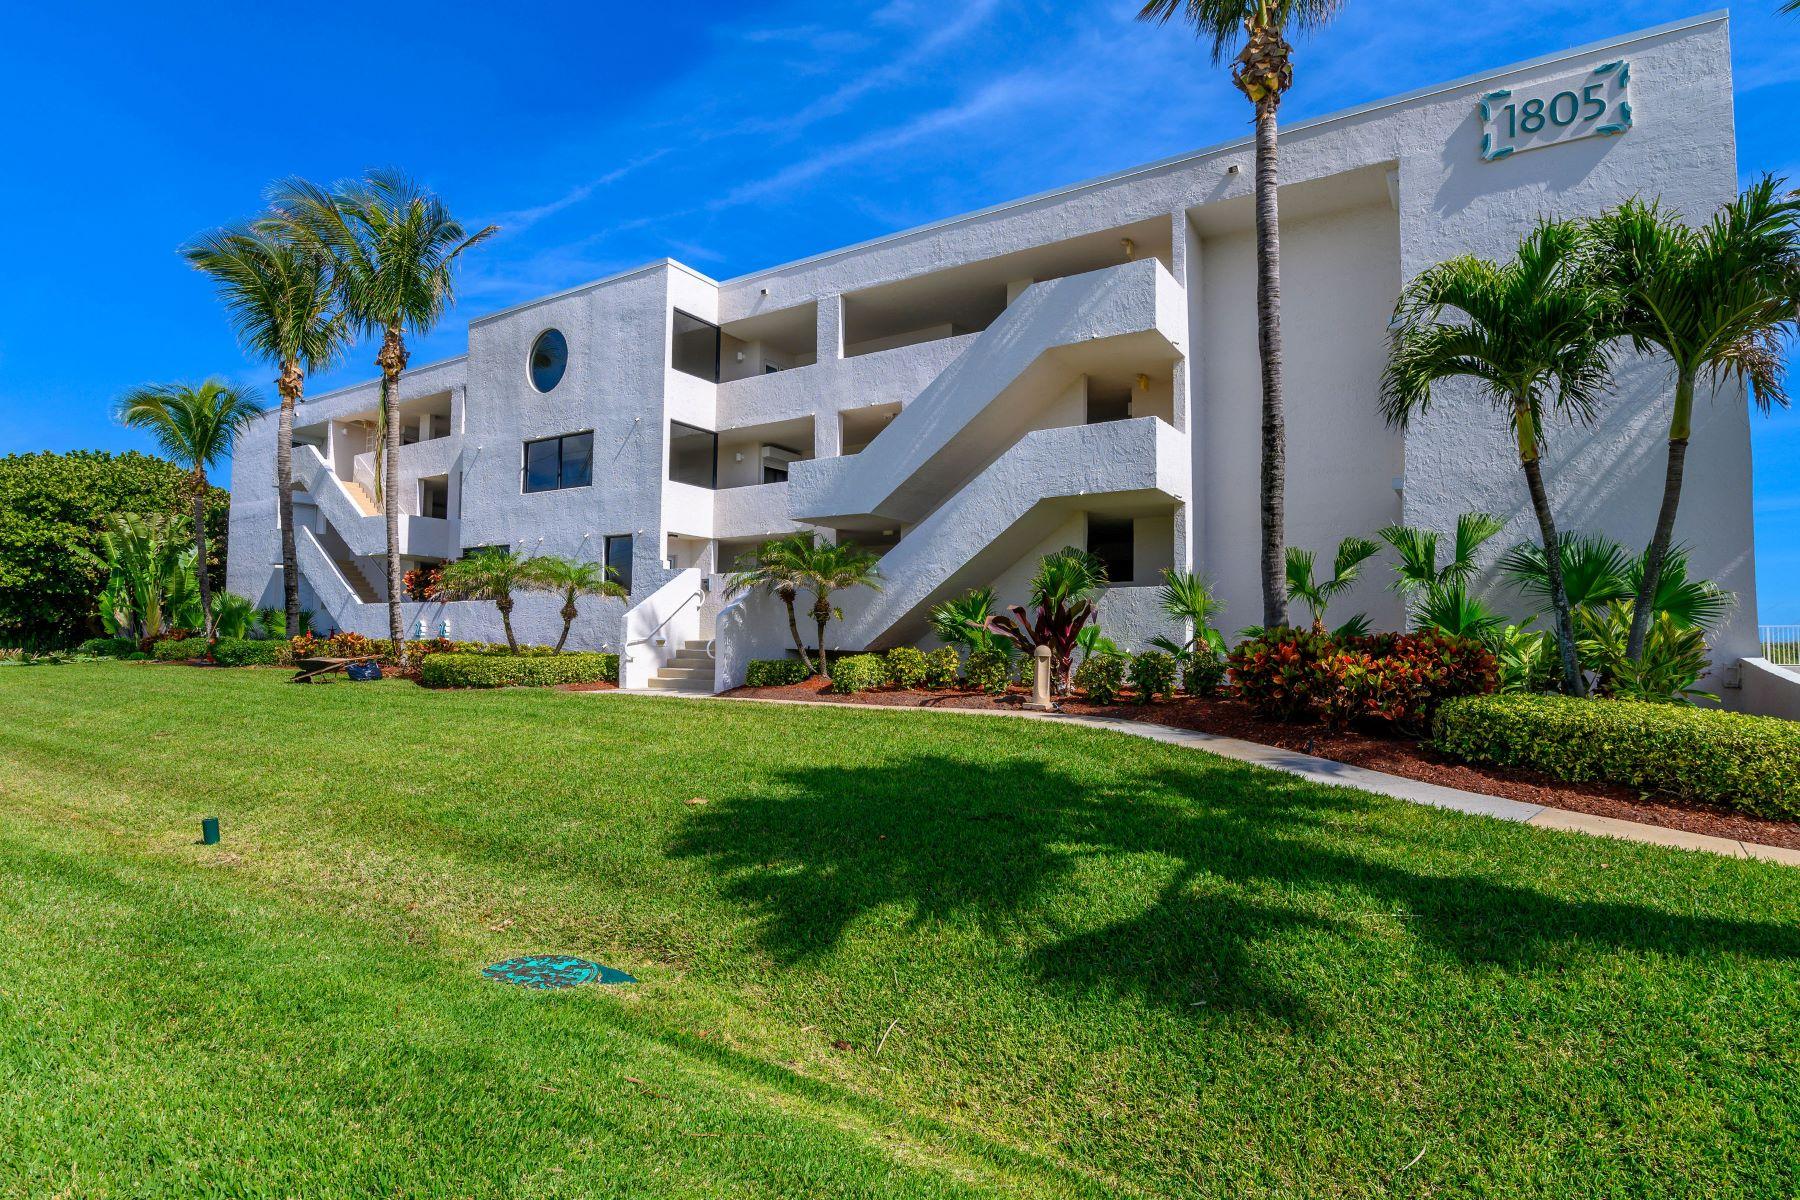 Condominiums for Sale at 1805 S Atlantic Street 131 Melbourne Beach, Florida 32951 United States